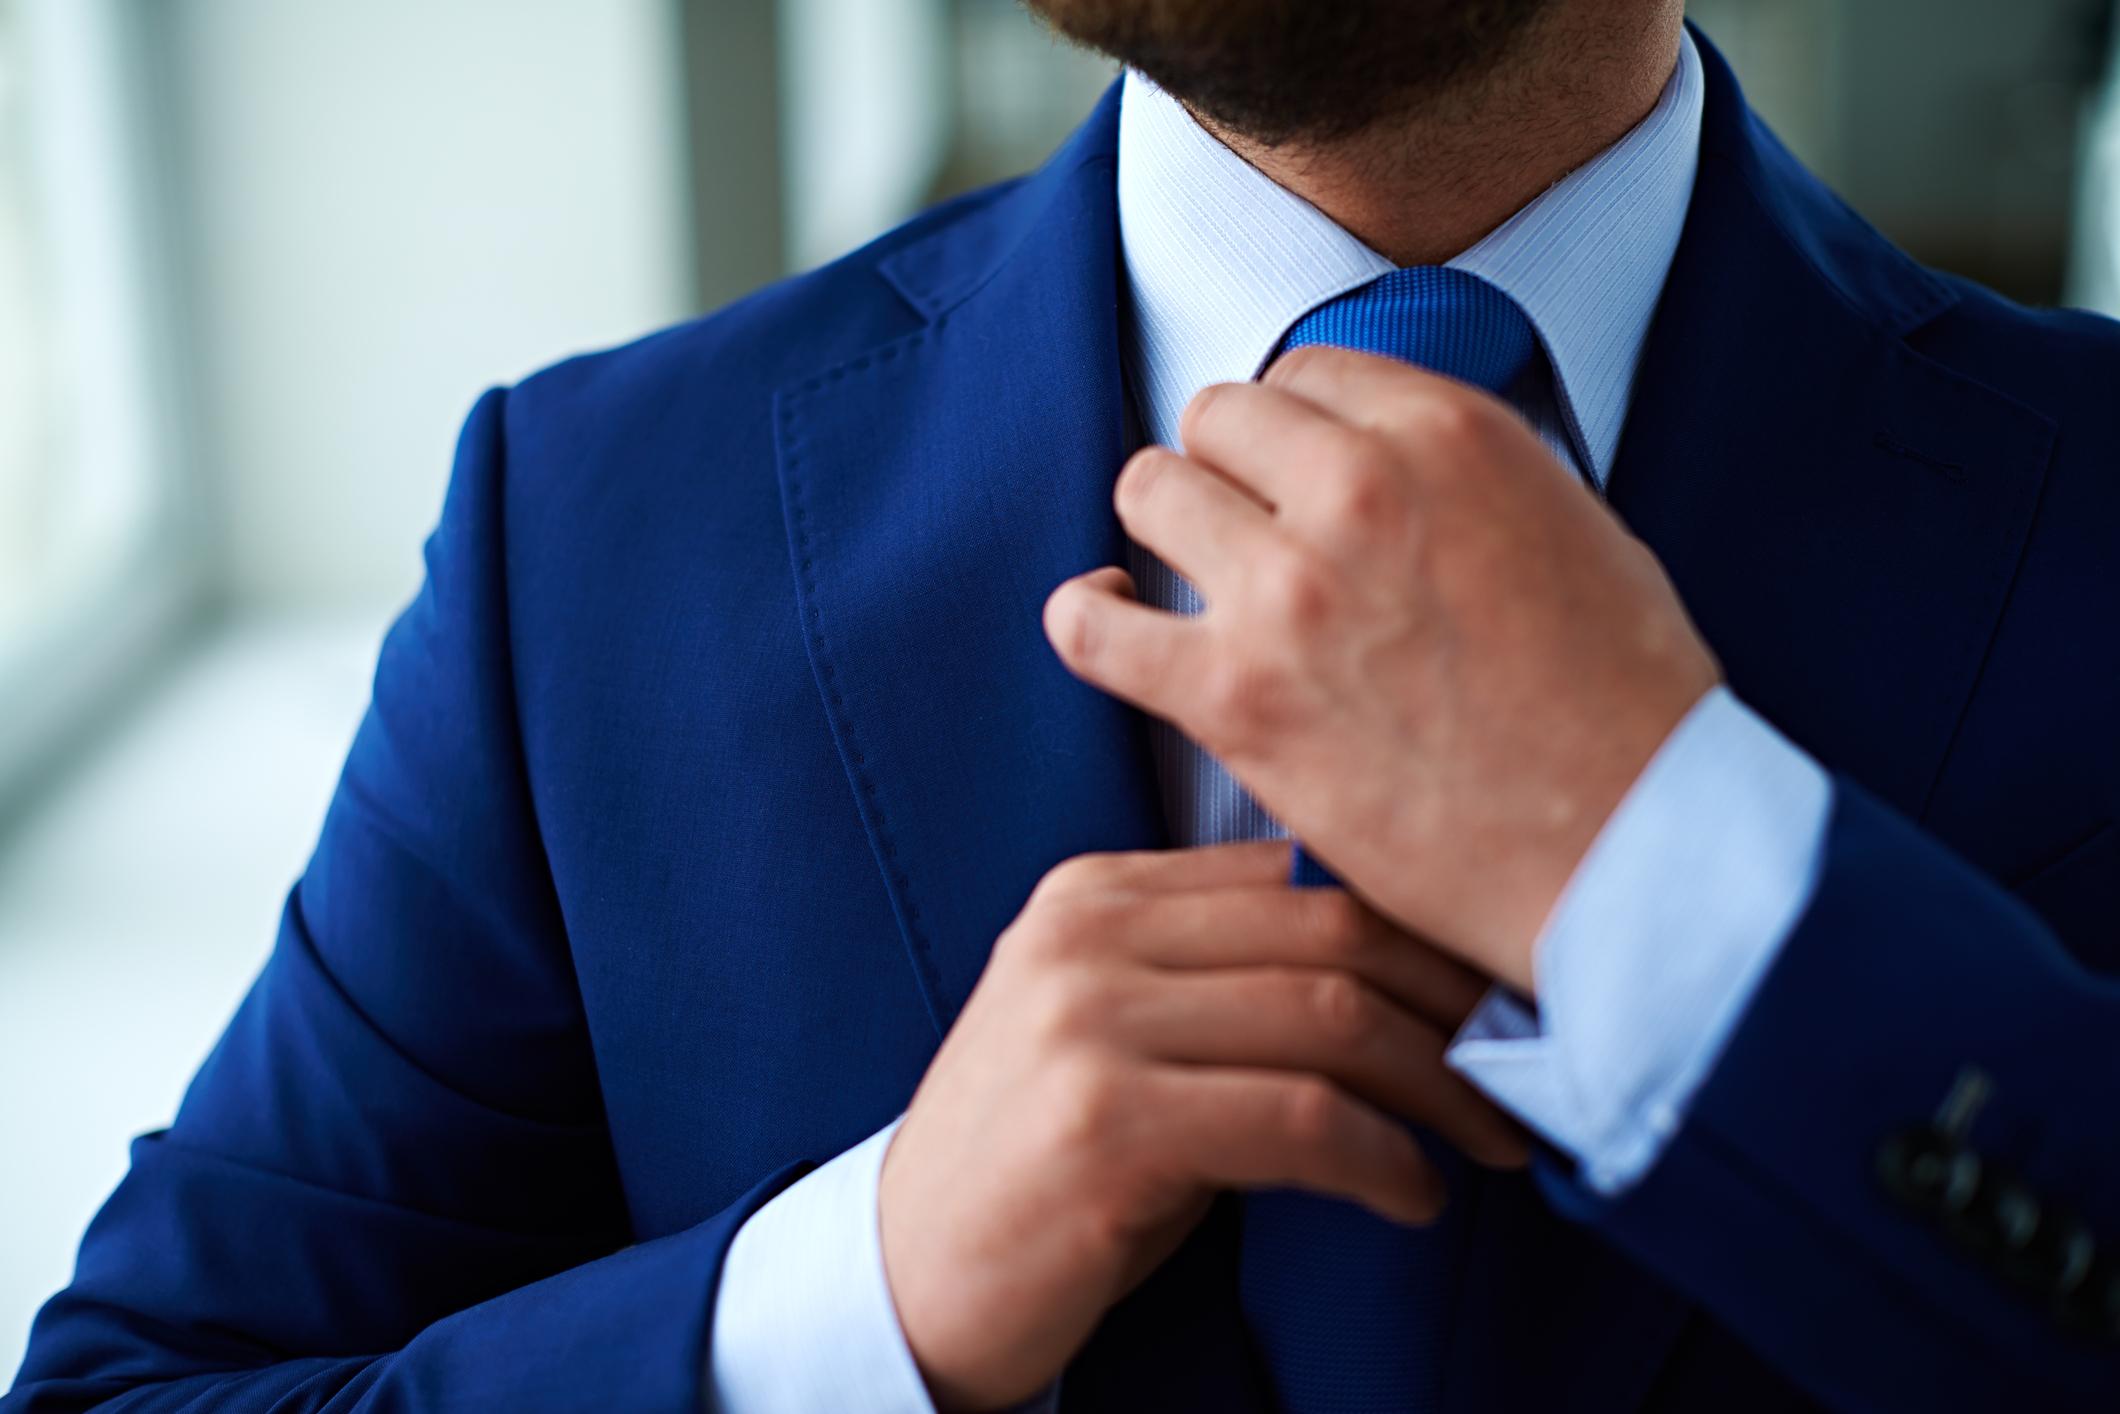 The Blue Tie